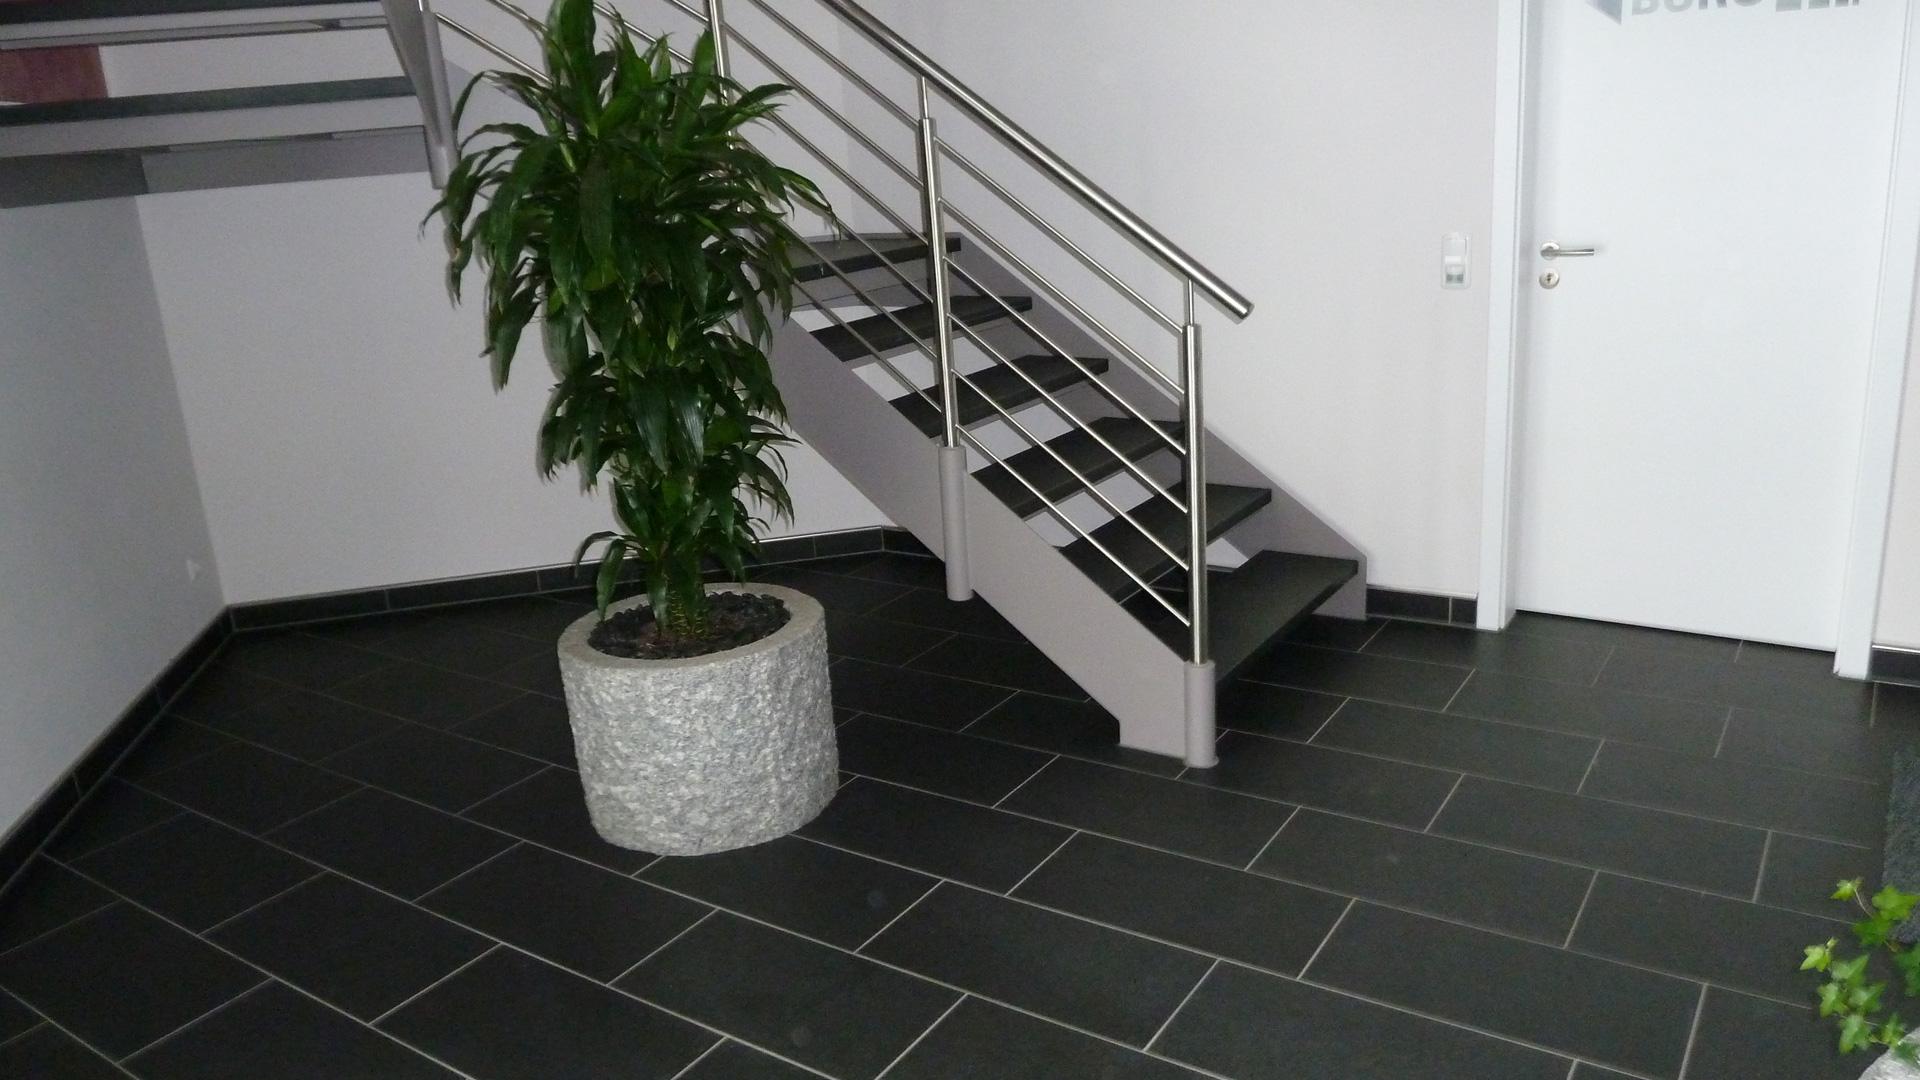 wagner treppenbau gmbh mainleus stahlkonstruktion. Black Bedroom Furniture Sets. Home Design Ideas